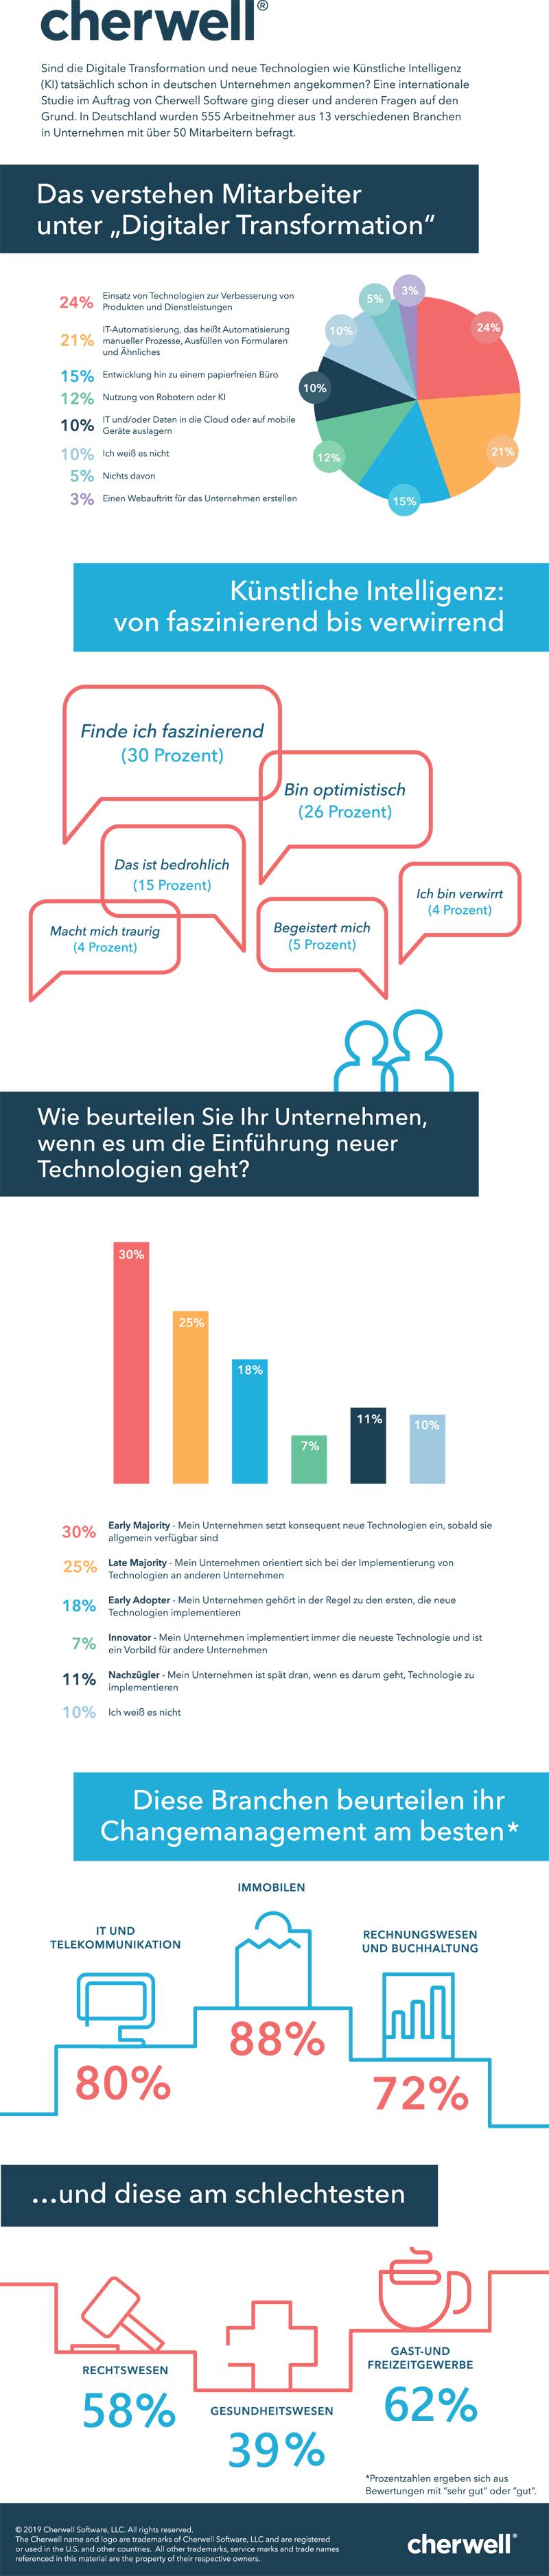 Cherwell ITSM Studie Infografik